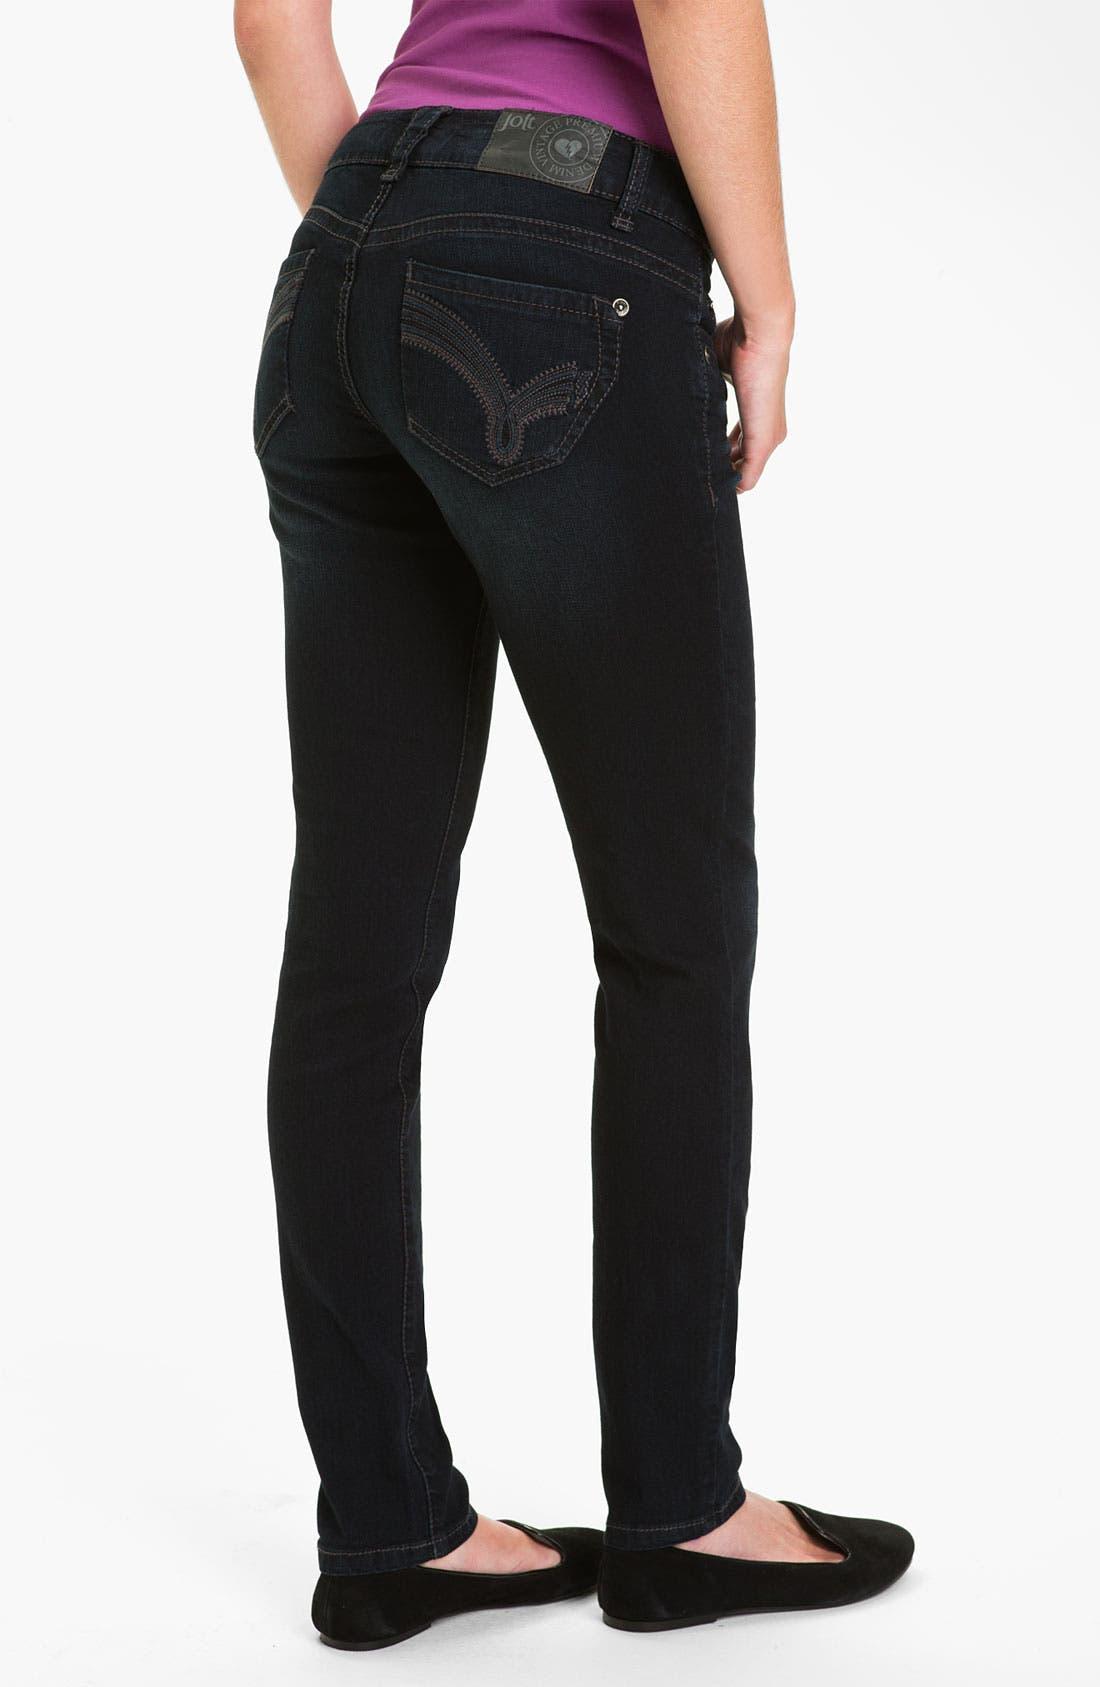 Alternate Image 1 Selected - Jolt 'J Pocket' Skinny Jeans (Juniors)